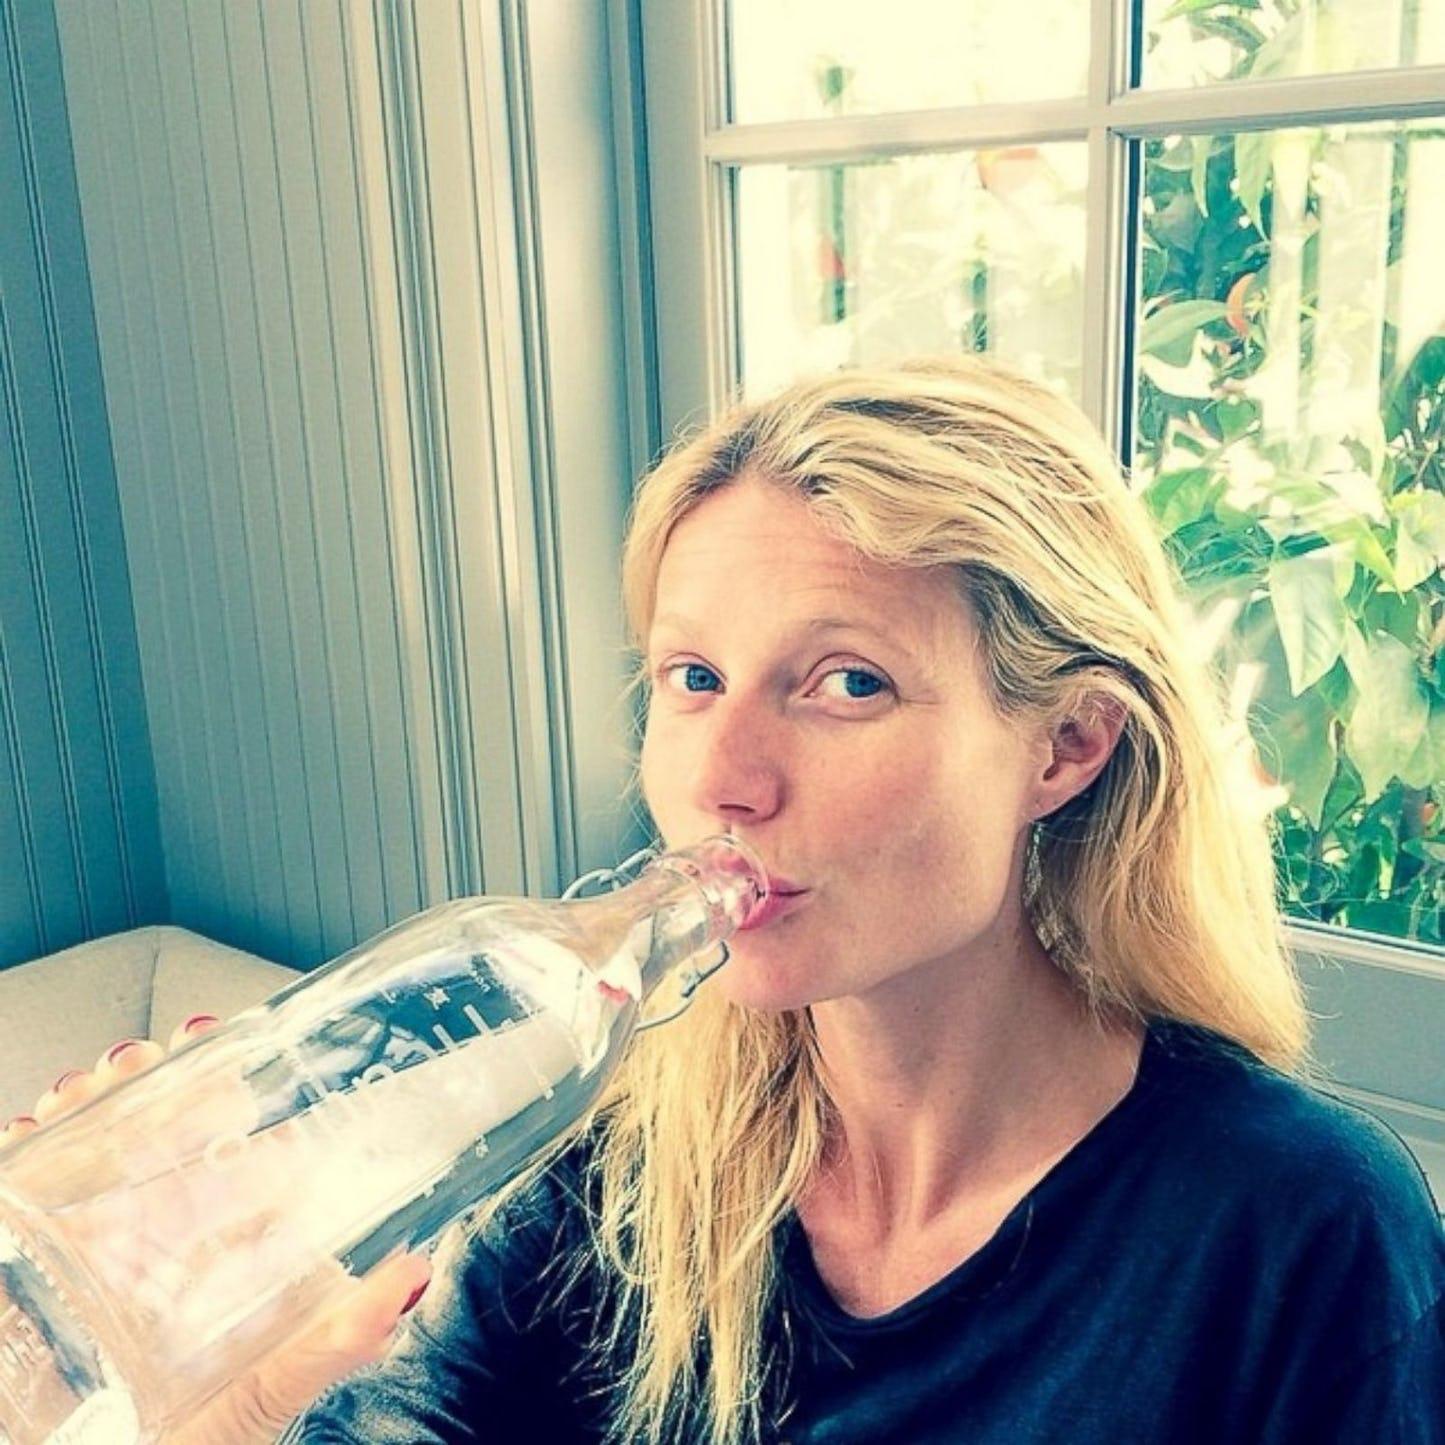 Gwyneth Paltrow makeup